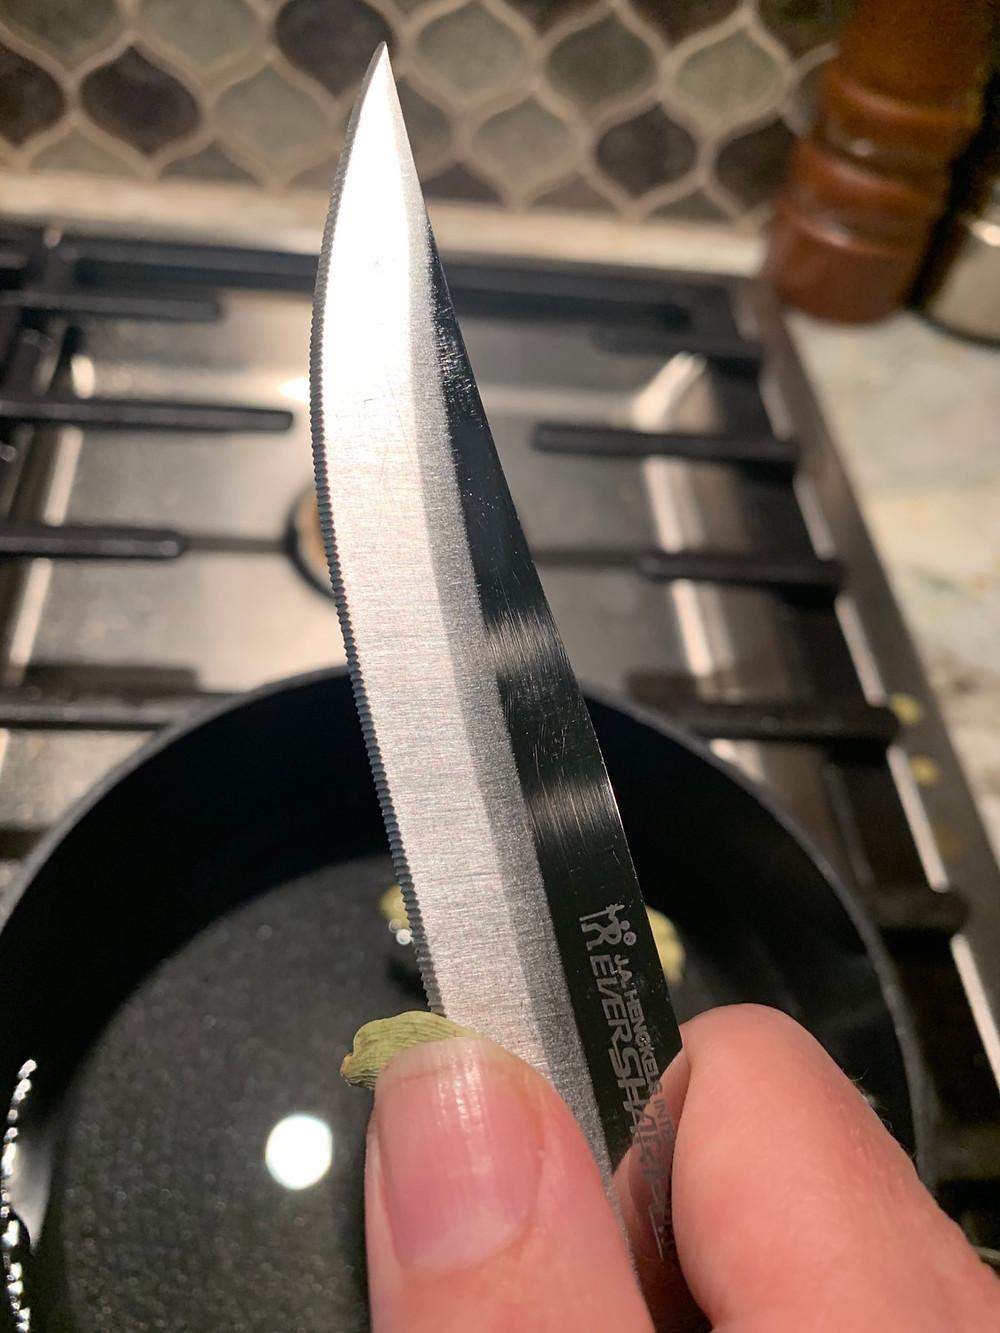 Use a sharp knife to break the cardamom pod